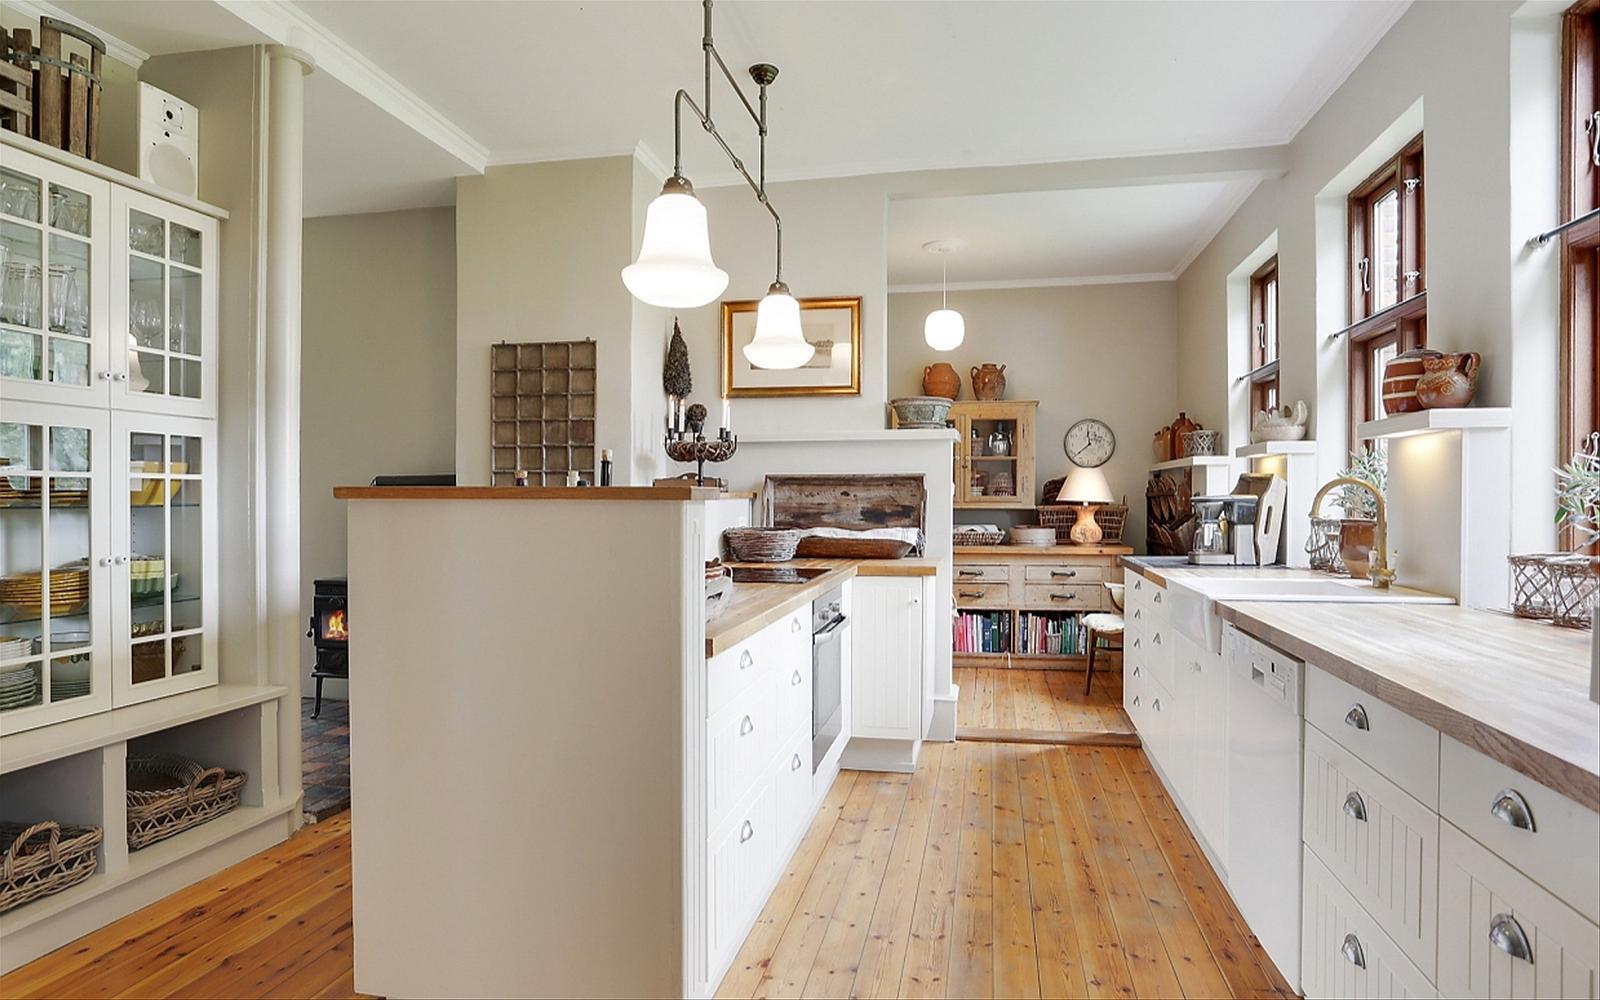 кухня белые фасады деревянный пол